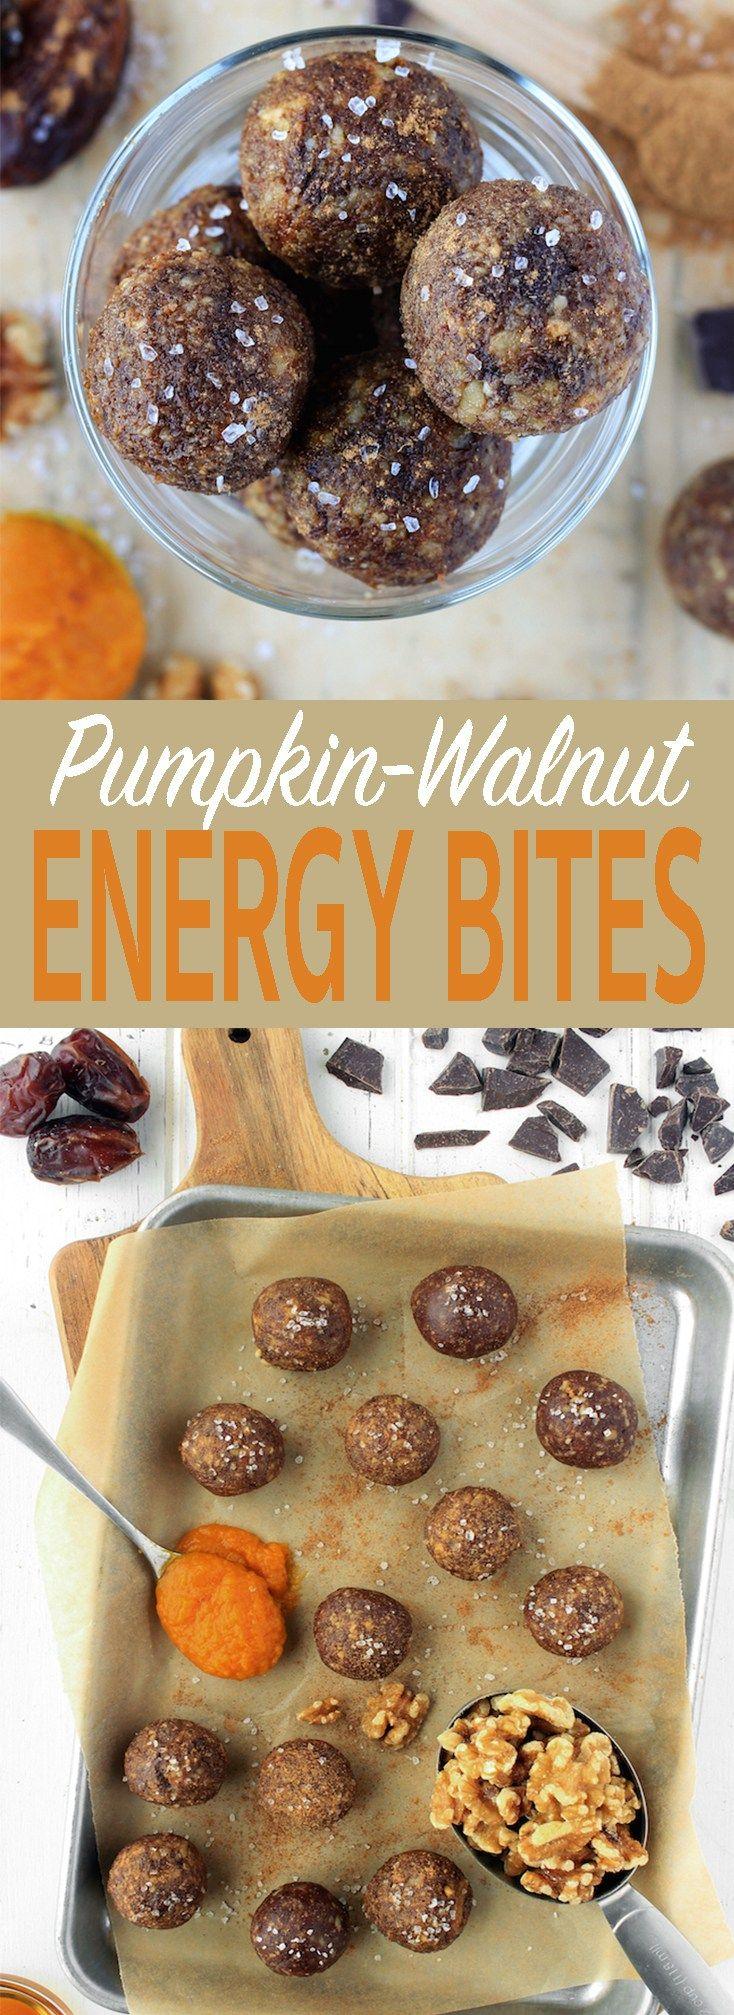 7 whole-food ingredients + 5 minutes = Pumpkin Walnut Energy Balls @California Walnuts #walnuts #CG #ad